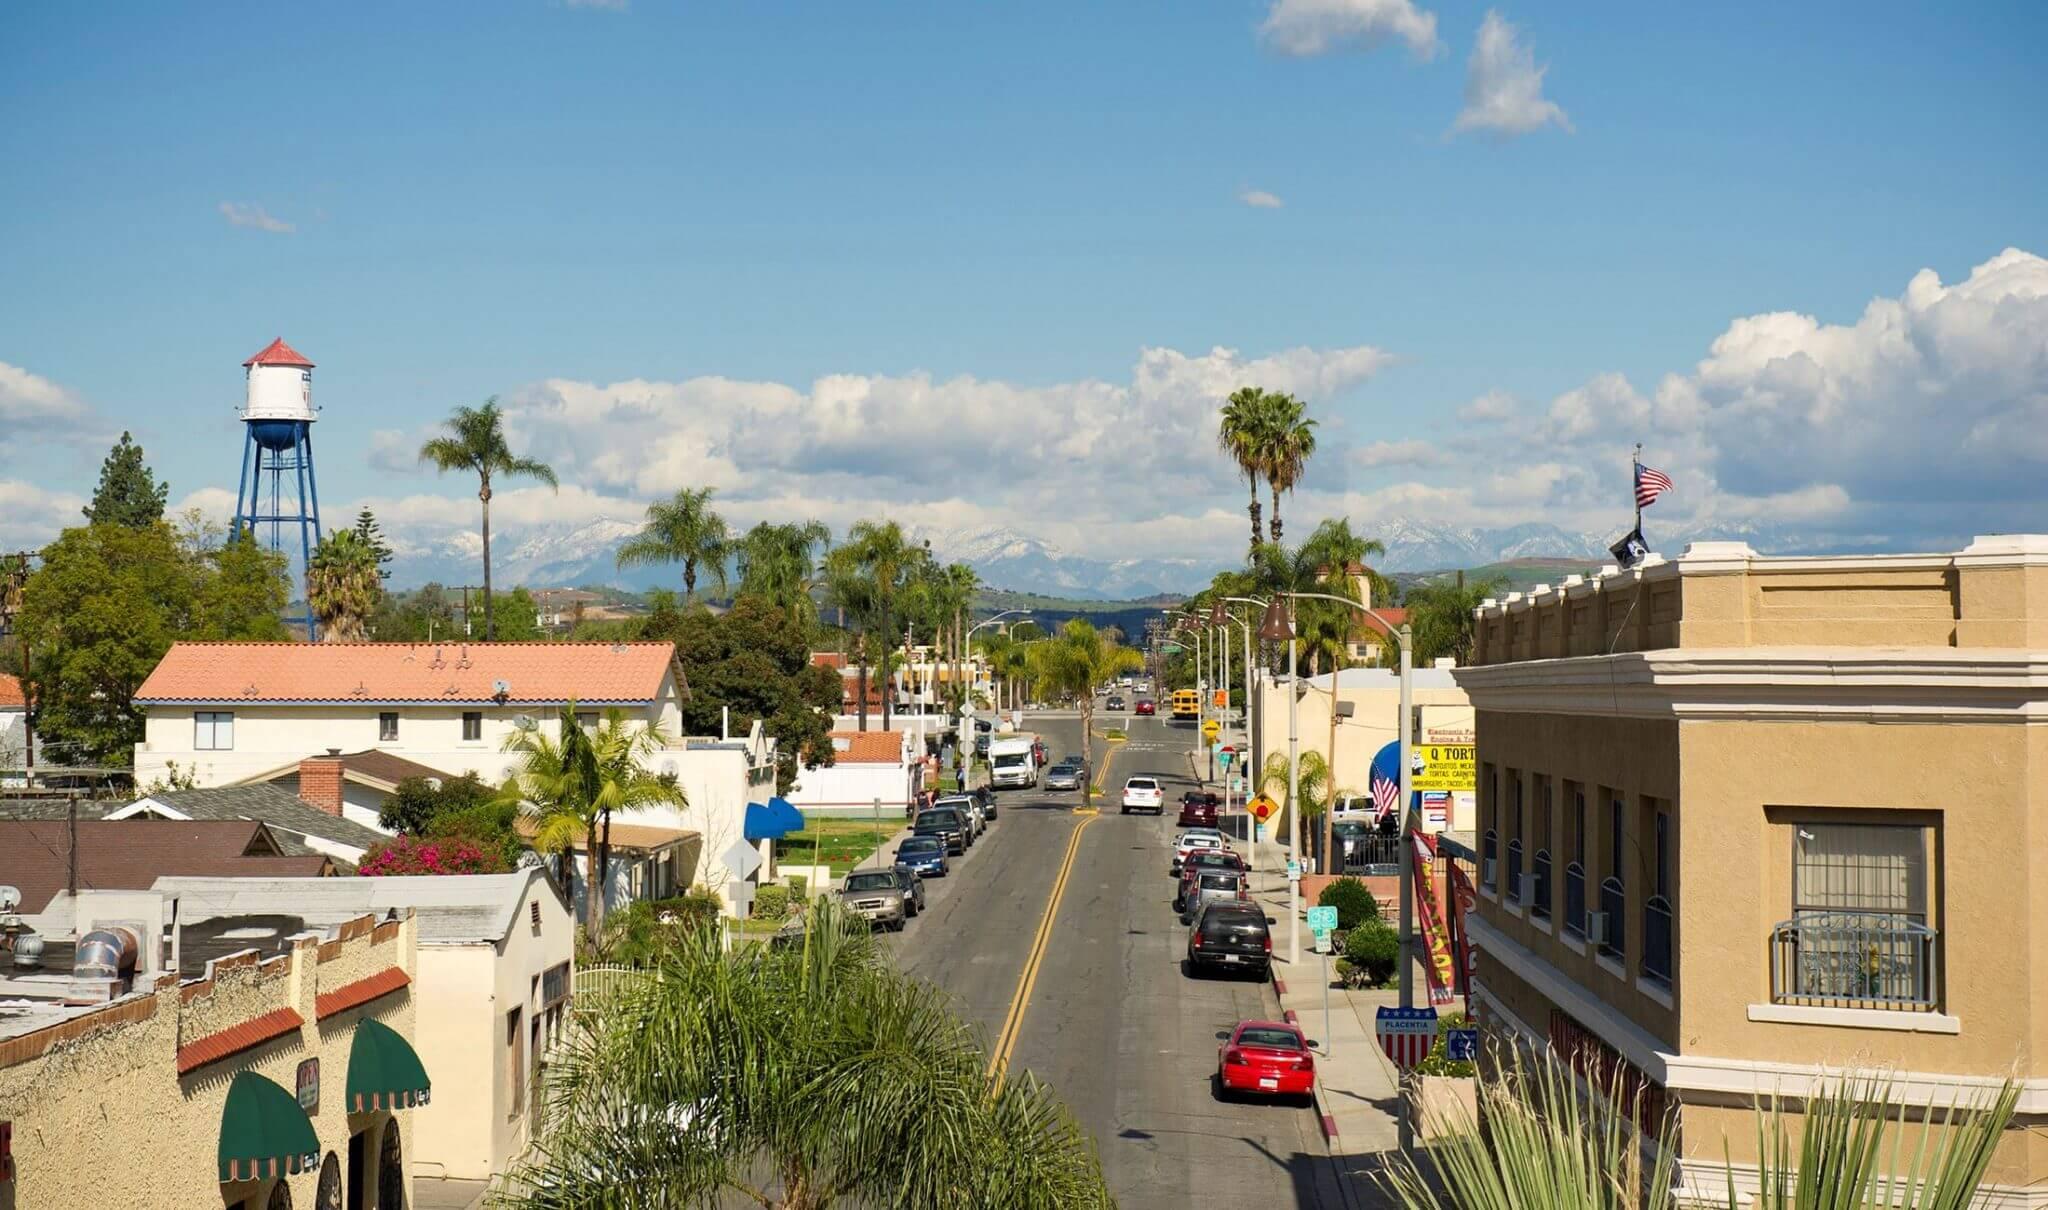 Old Town Placentia California